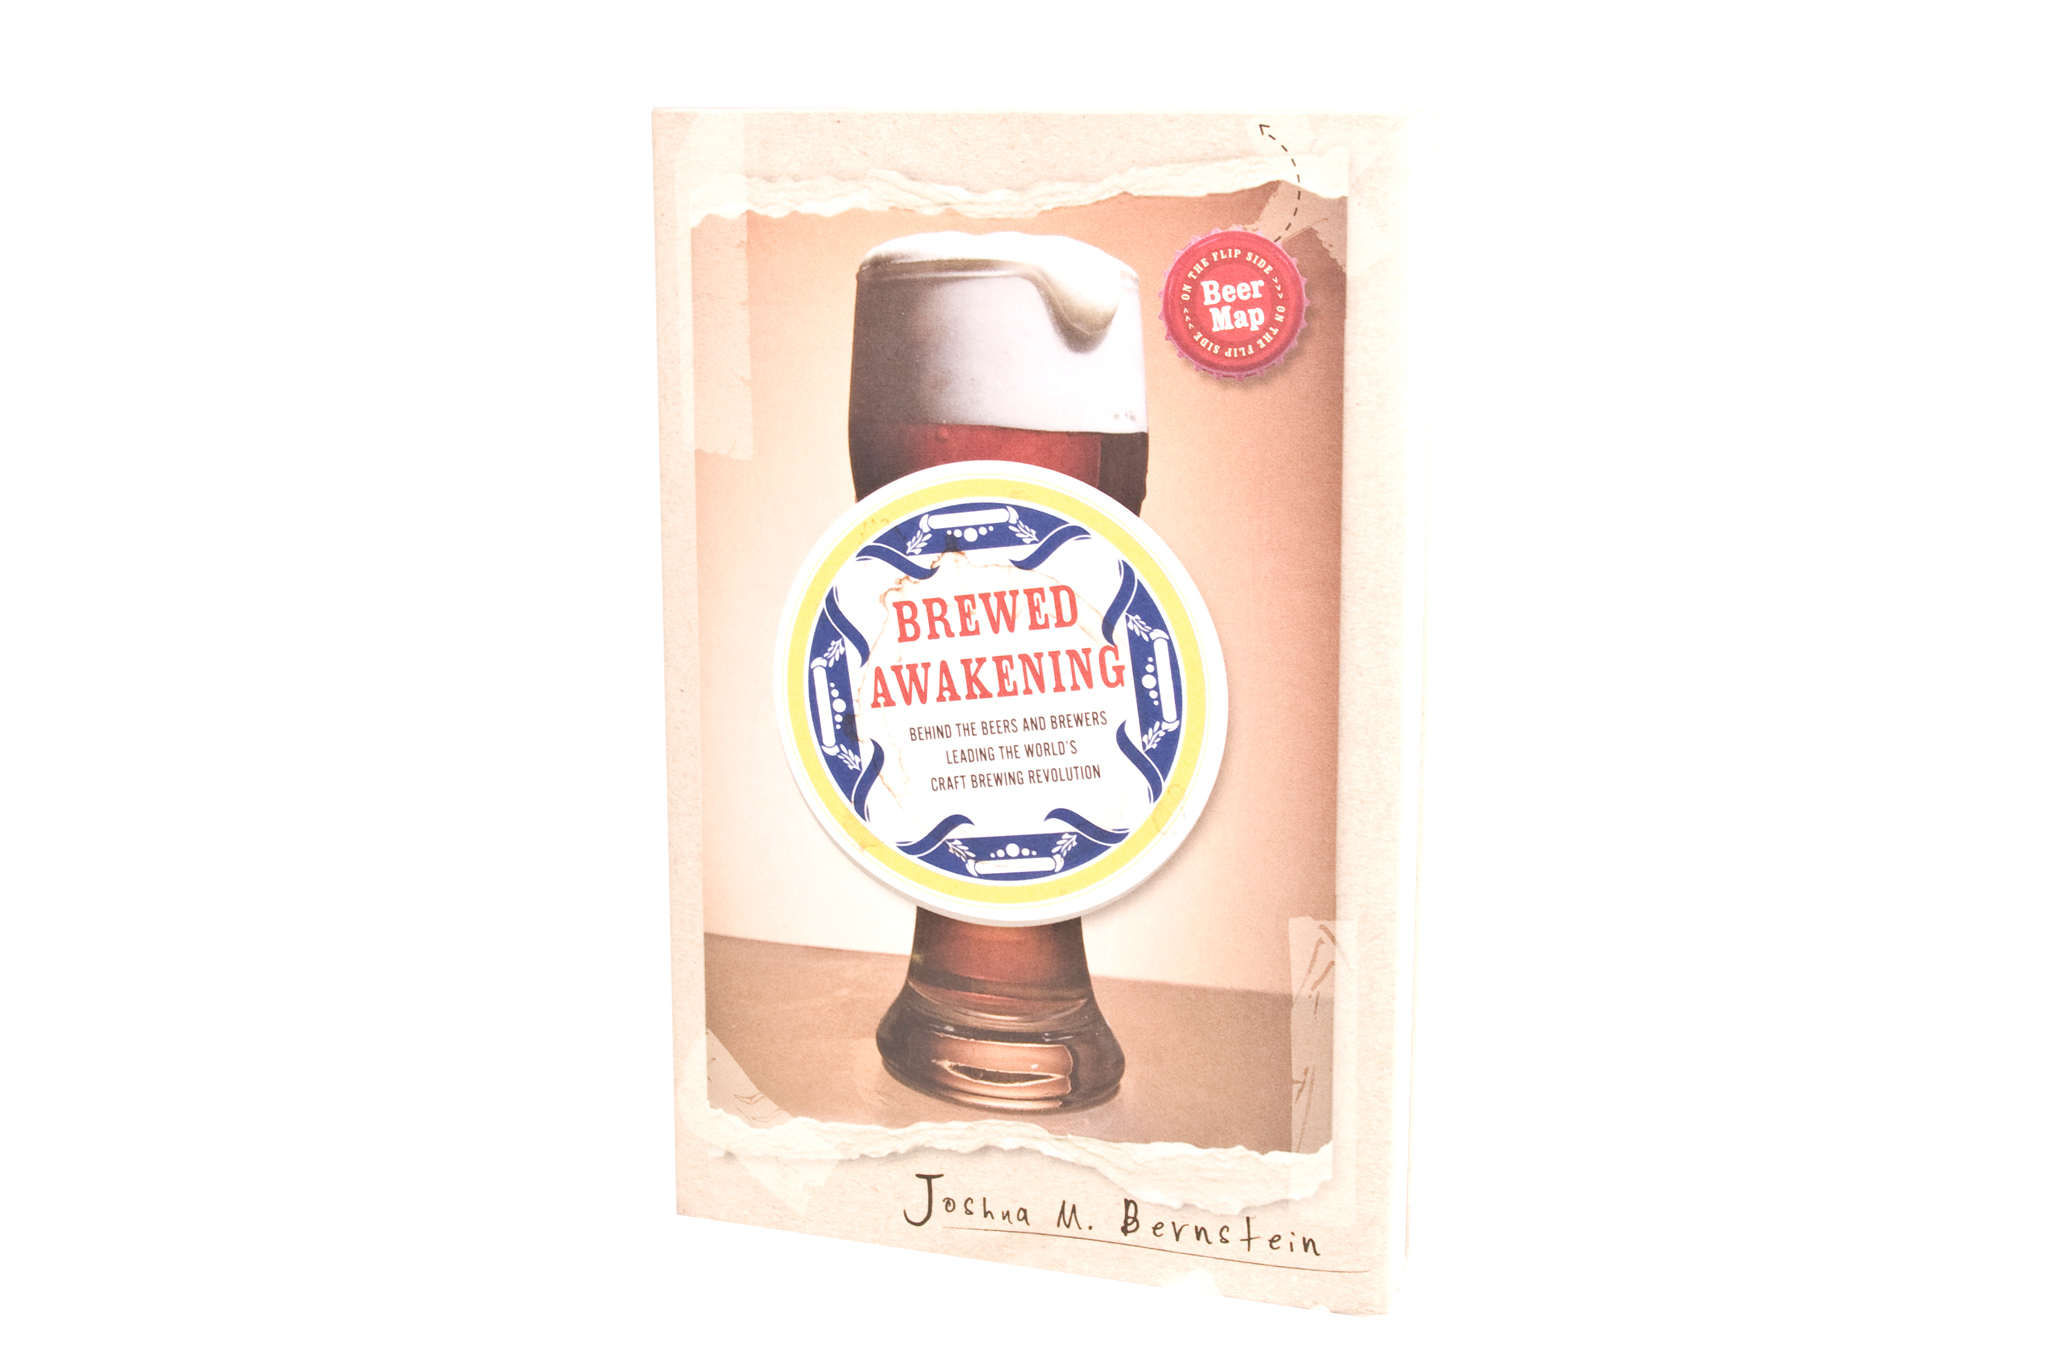 The brewmaster's bookshelf